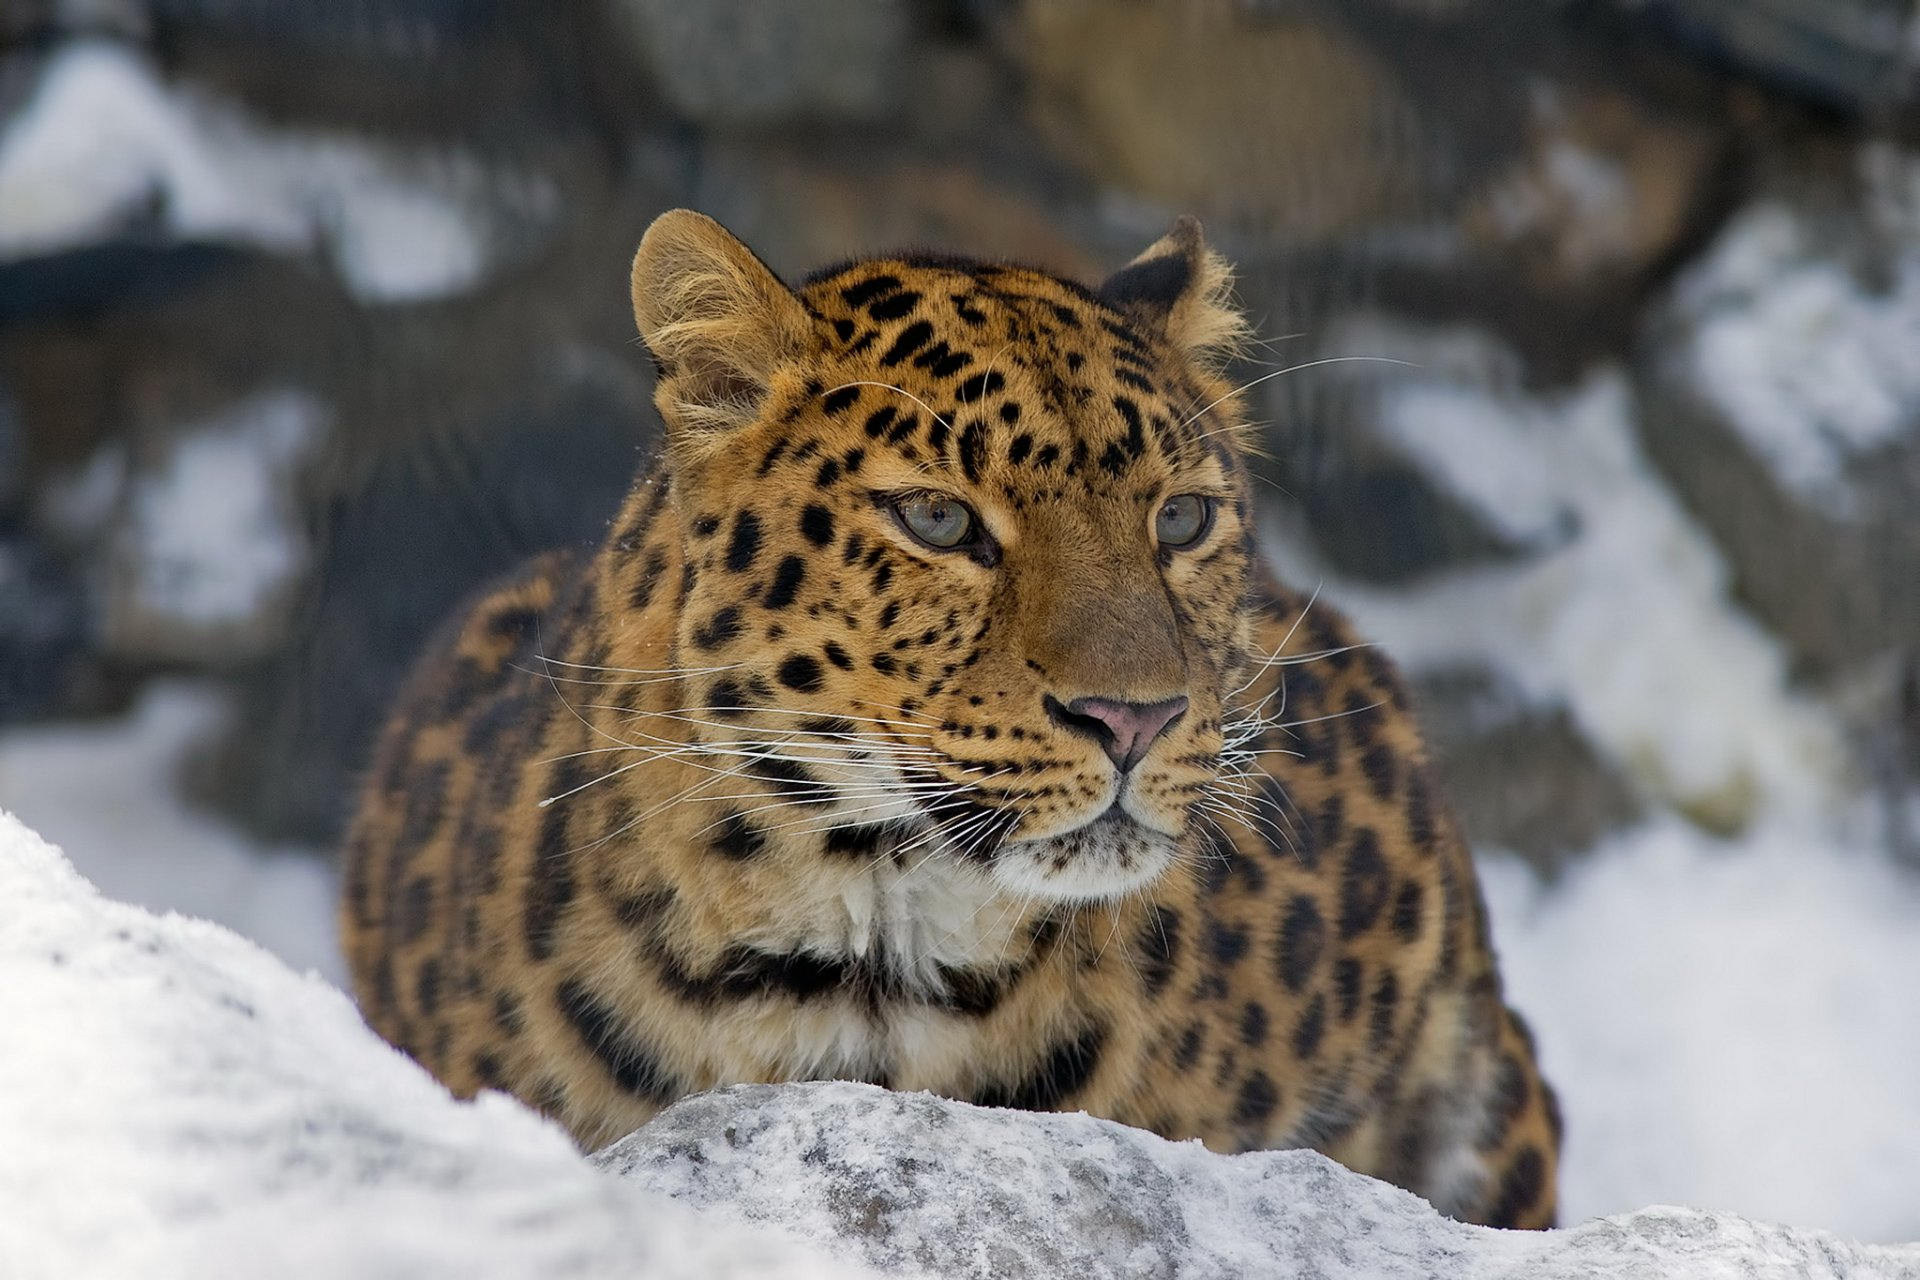 Картинки с леопардом фото, пожеланием